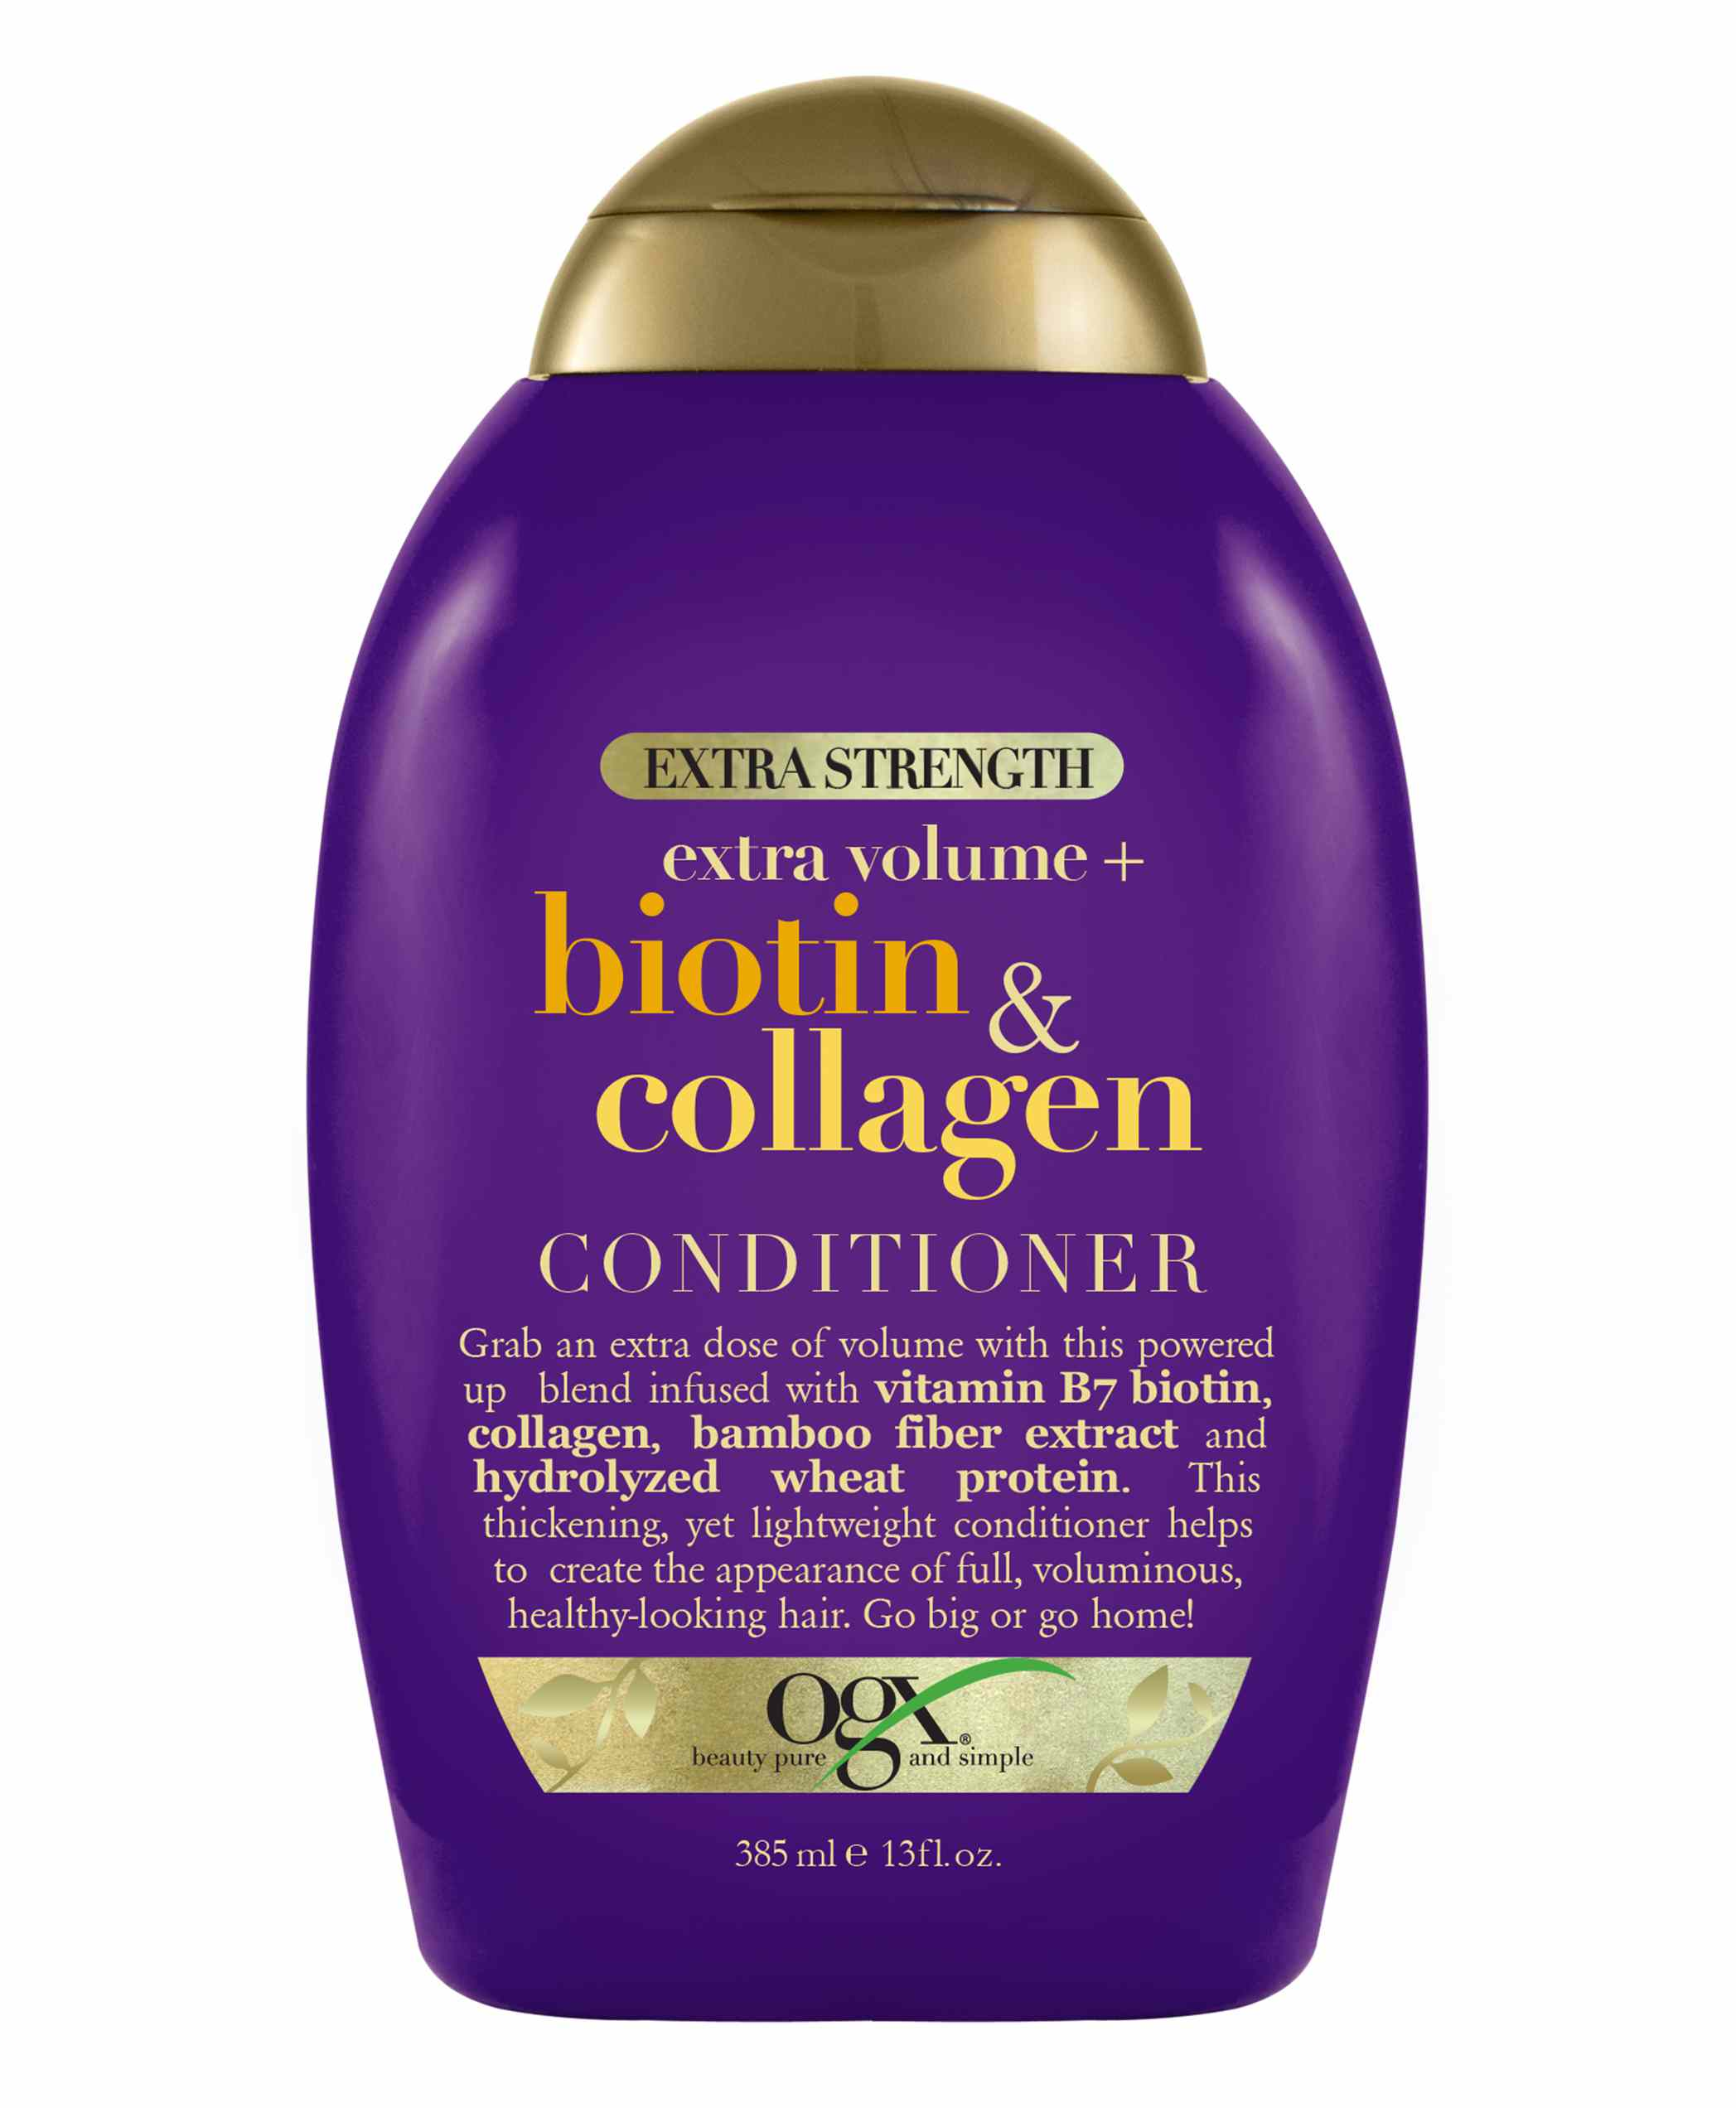 OGX Extra Strength Extra Volume + Biotin & Collagen Conditioner